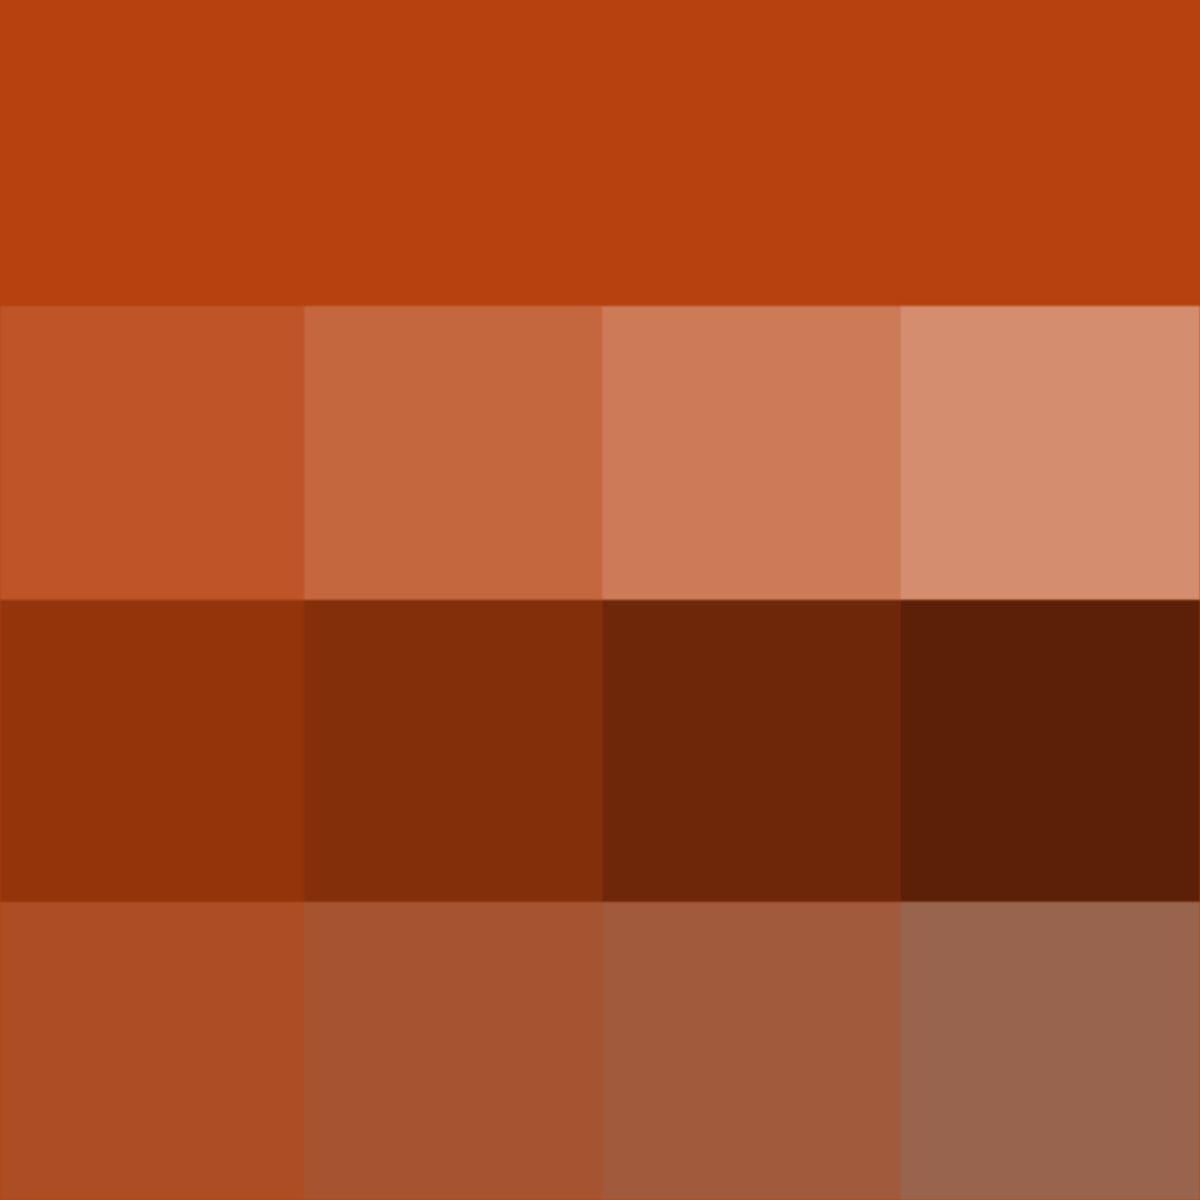 Rust Hue Tints Shades Tones Hue Pure Color With Tints Hue White Shades Hue Black And Tones Hue Rust Color Paint Color Textures Colour Tint